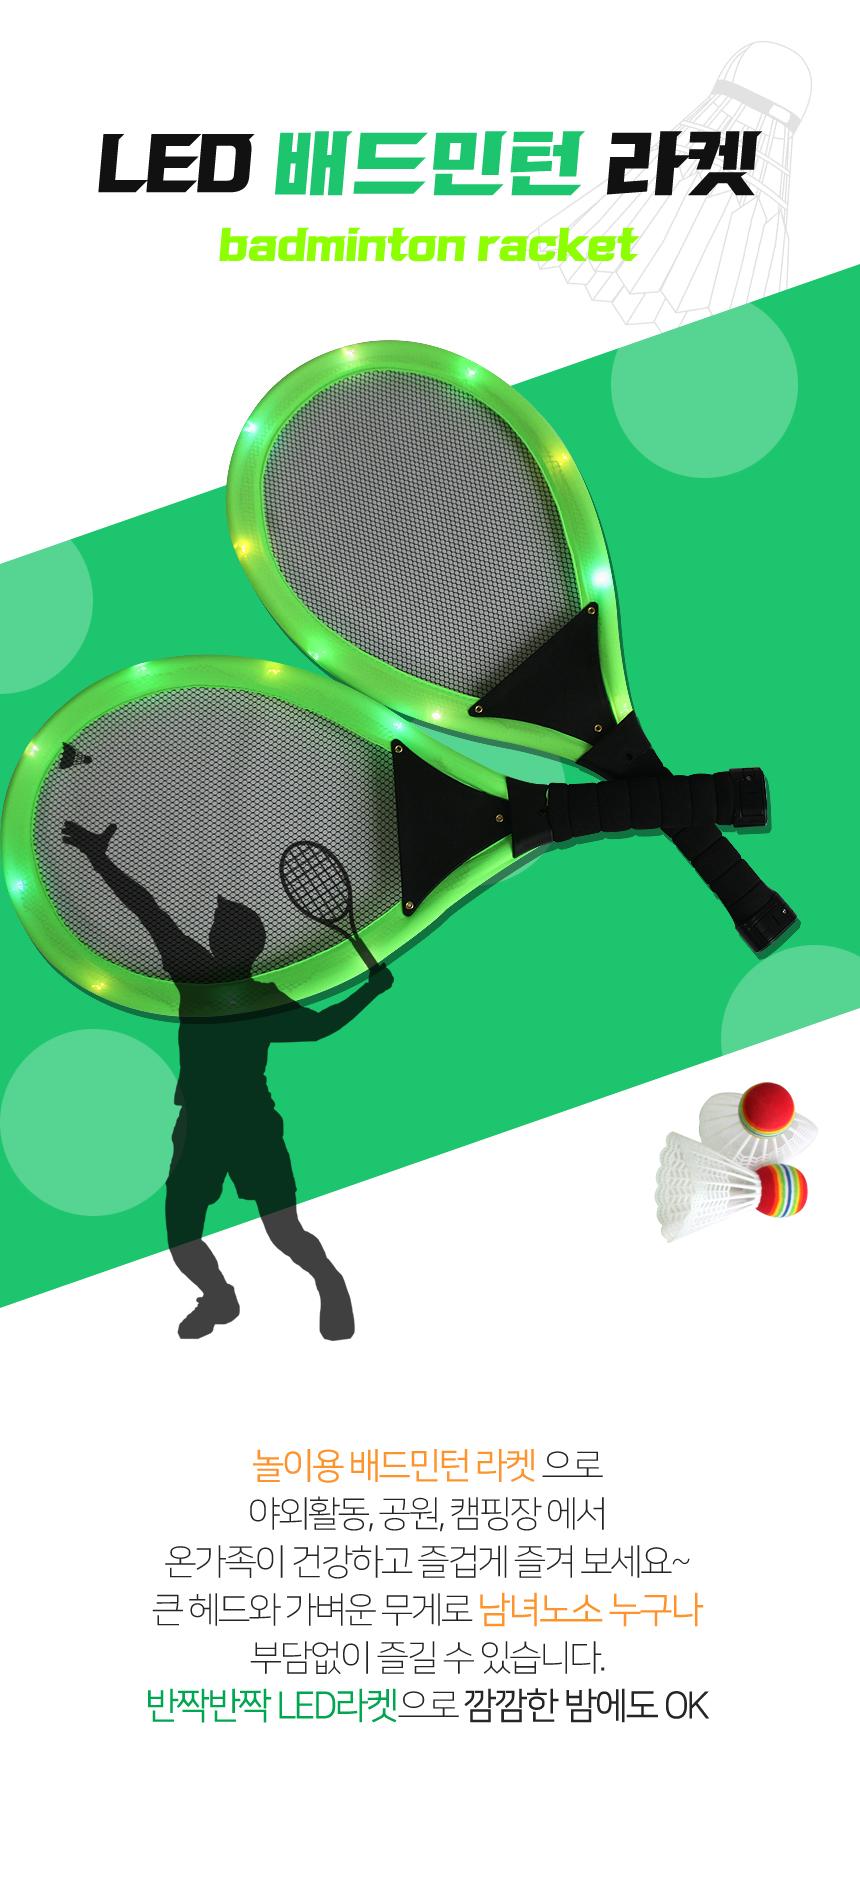 badminton_01.jpg